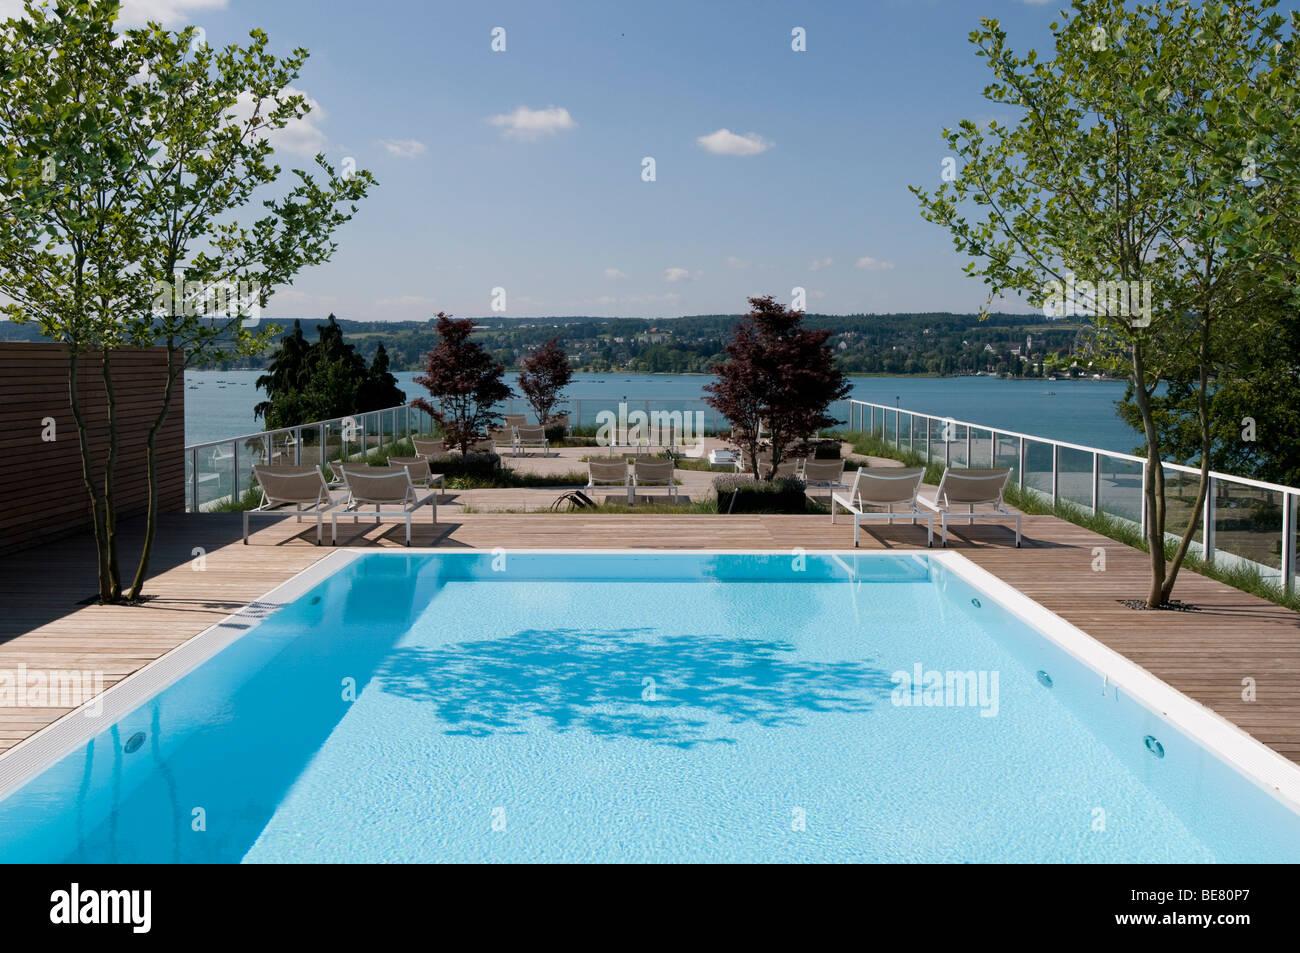 roof pool stockfotos roof pool bilder alamy. Black Bedroom Furniture Sets. Home Design Ideas